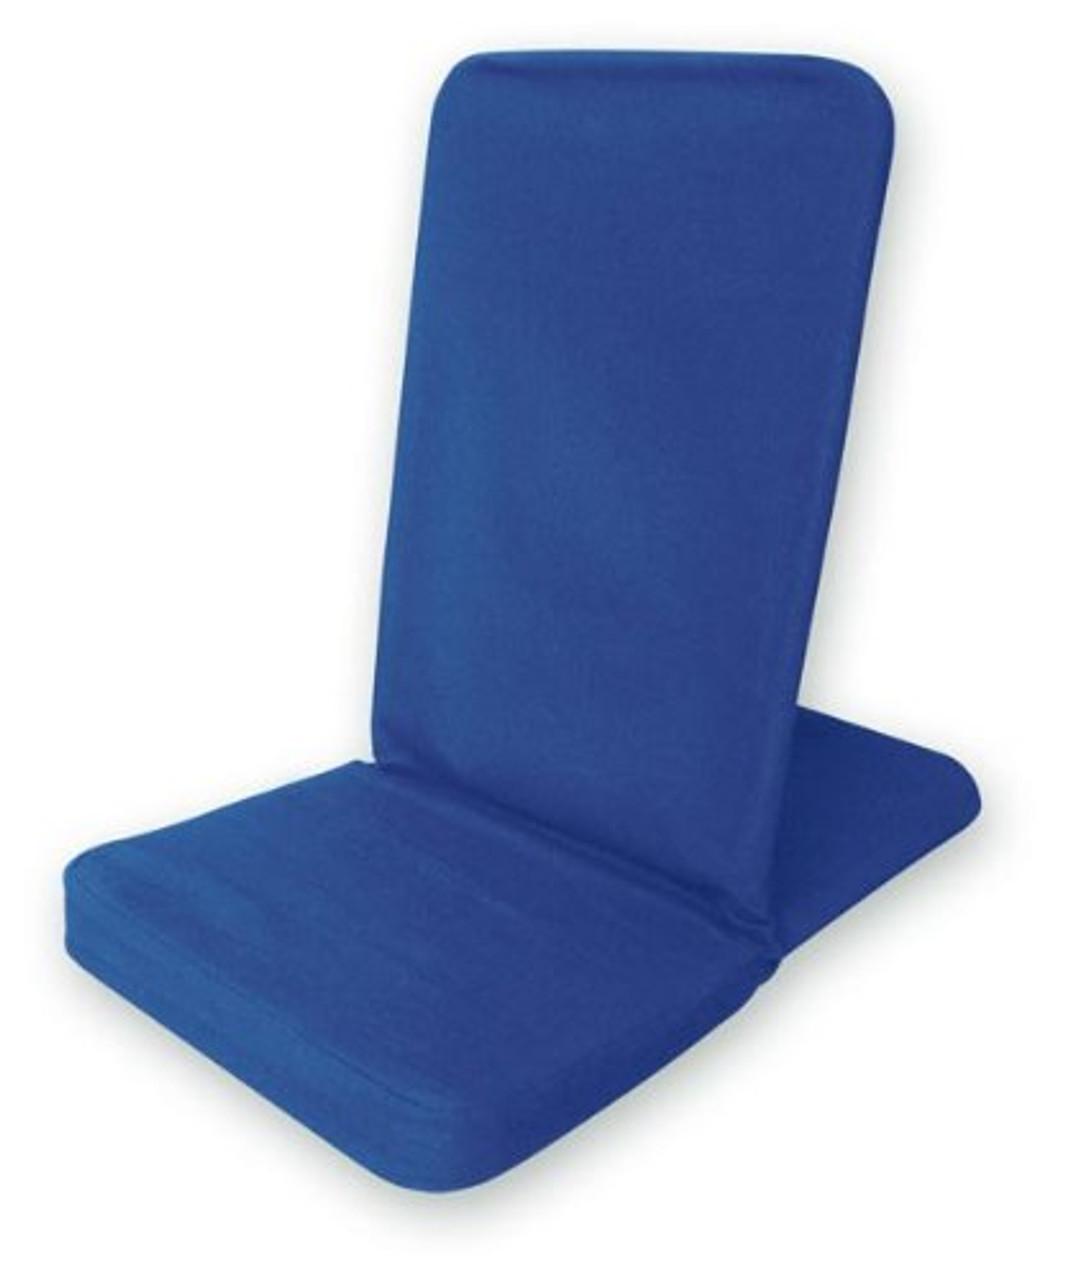 Backjack Chair For Meditation And Floor Sitting